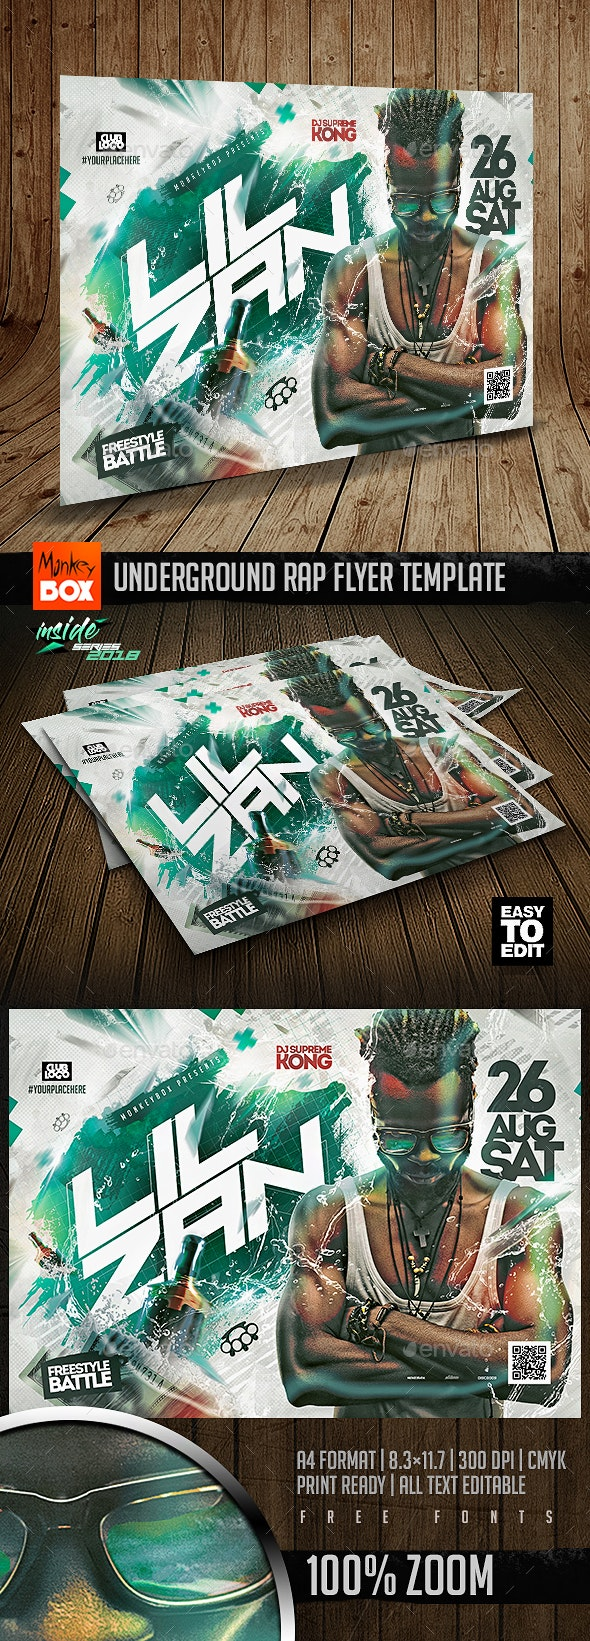 Underground Rap Flyer Template - Flyers Print Templates